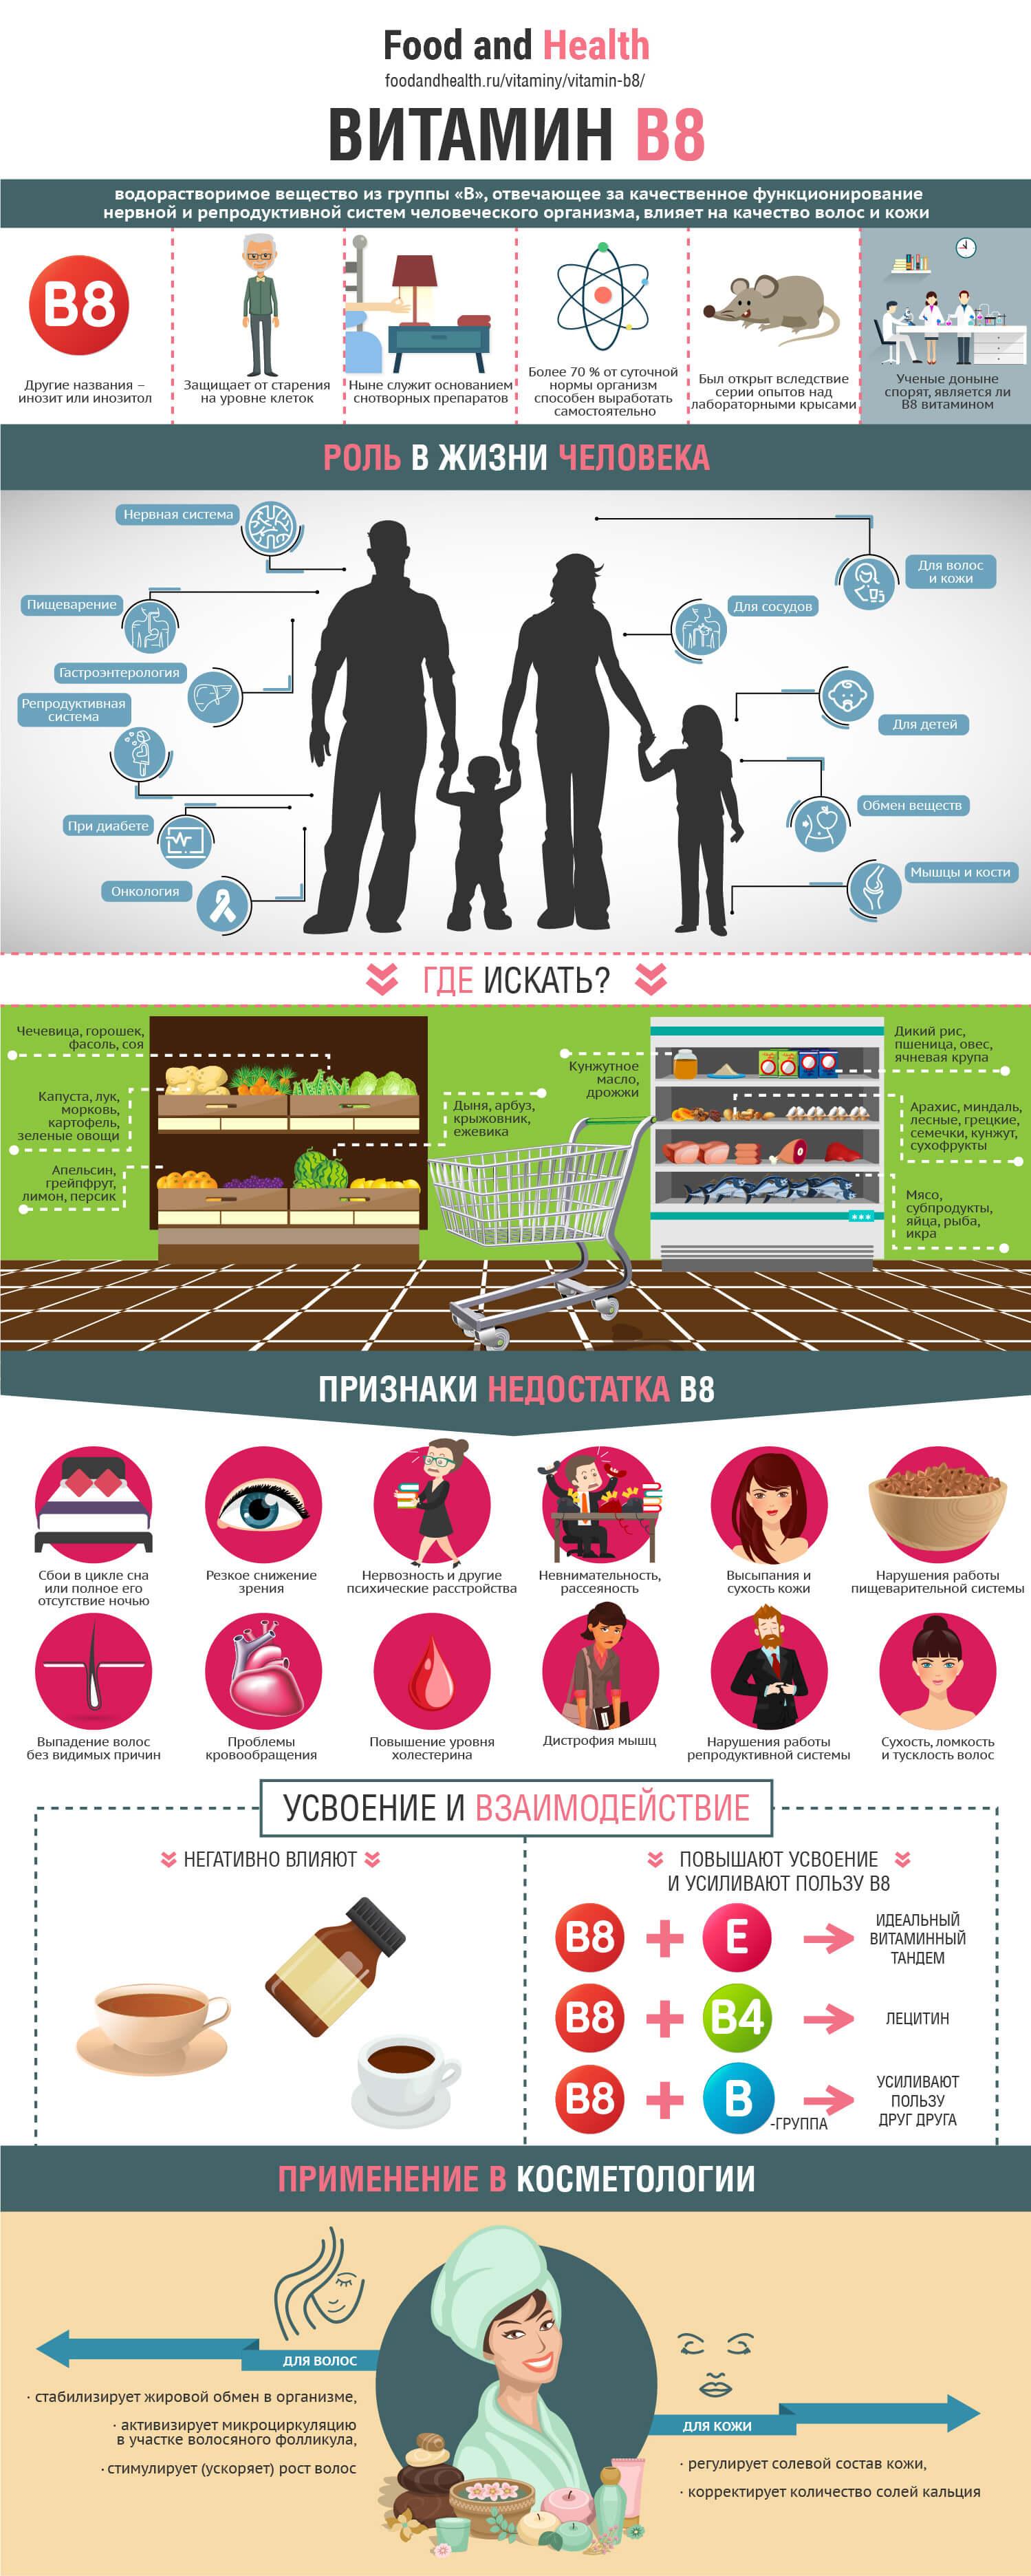 Витамин B8: инфографика